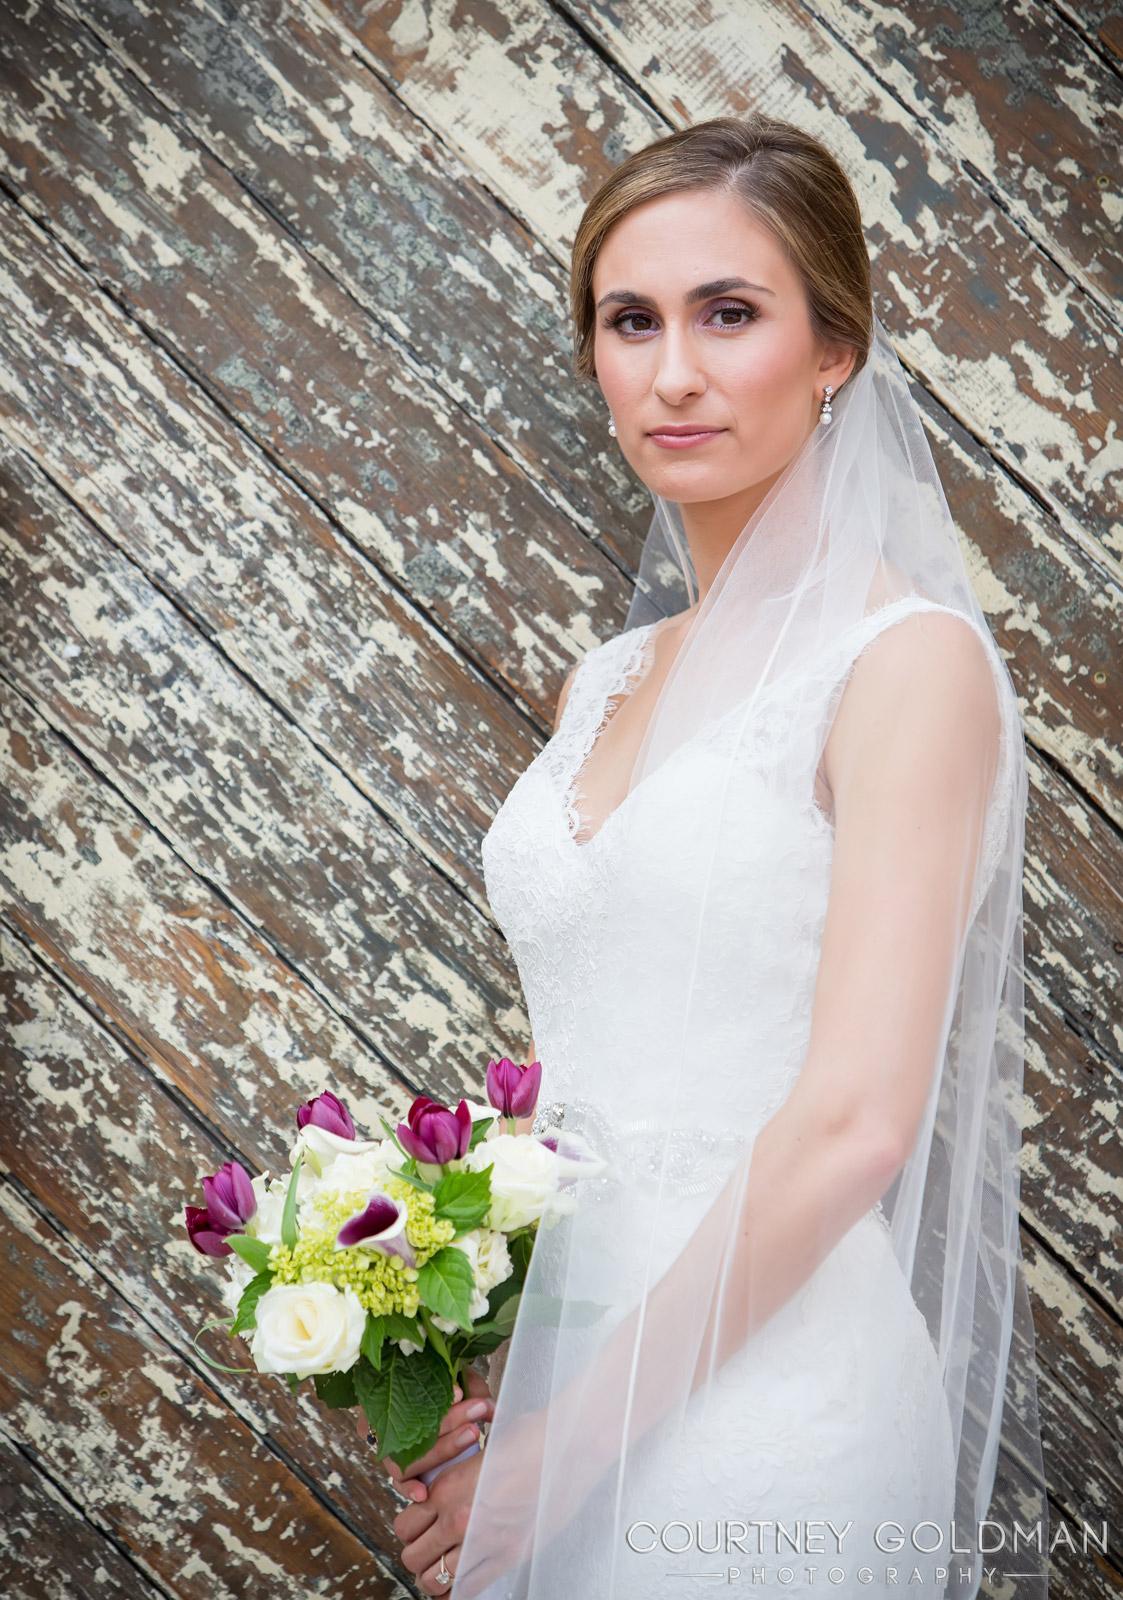 Atlanta-Wedding-Photography-by-Courtney-Goldman-54.jpg